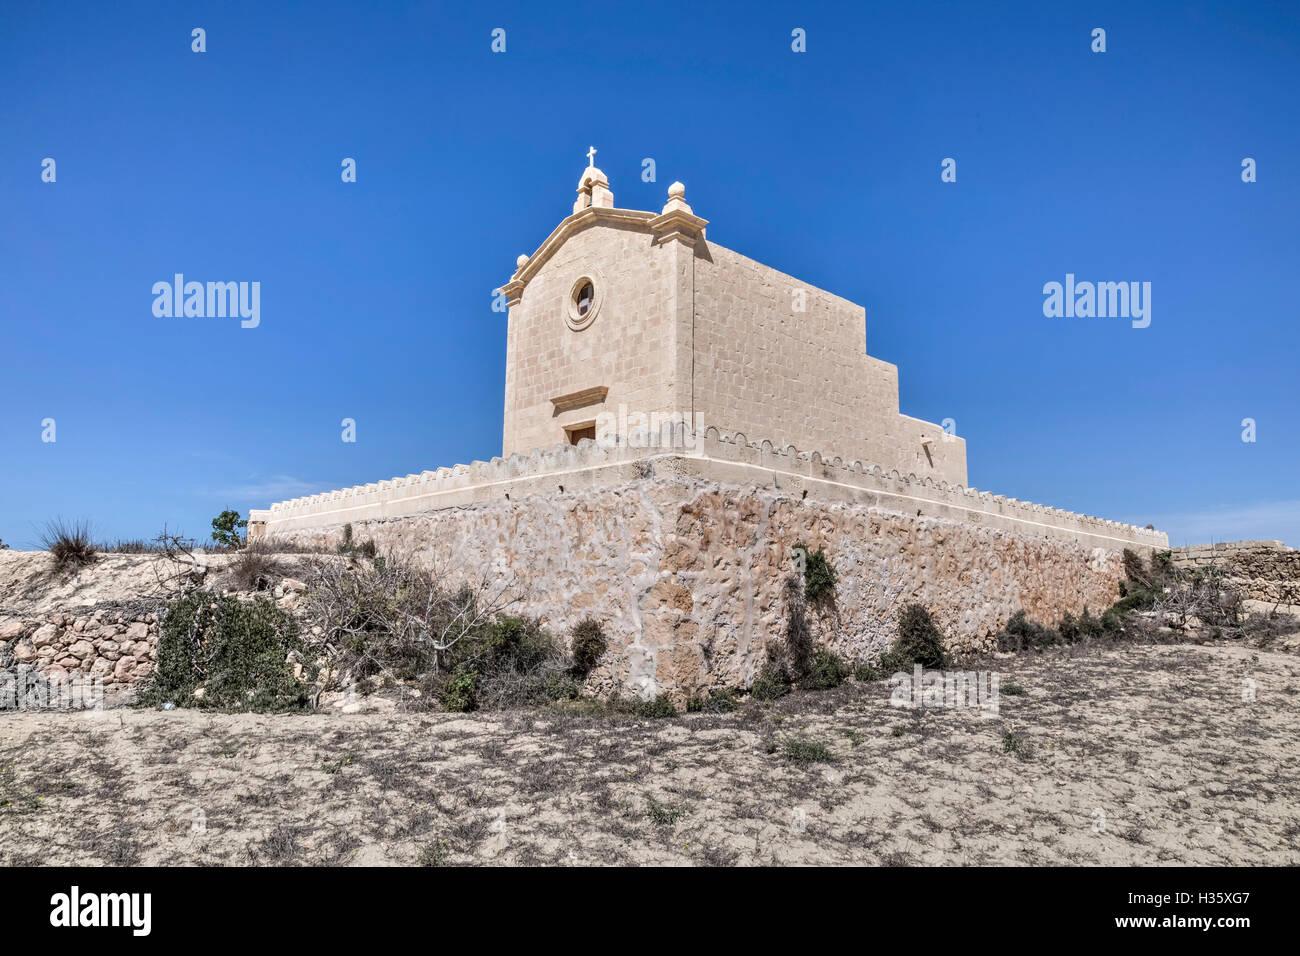 Capilla de San Dimitri, Gharb, Gozo, Malta Imagen De Stock